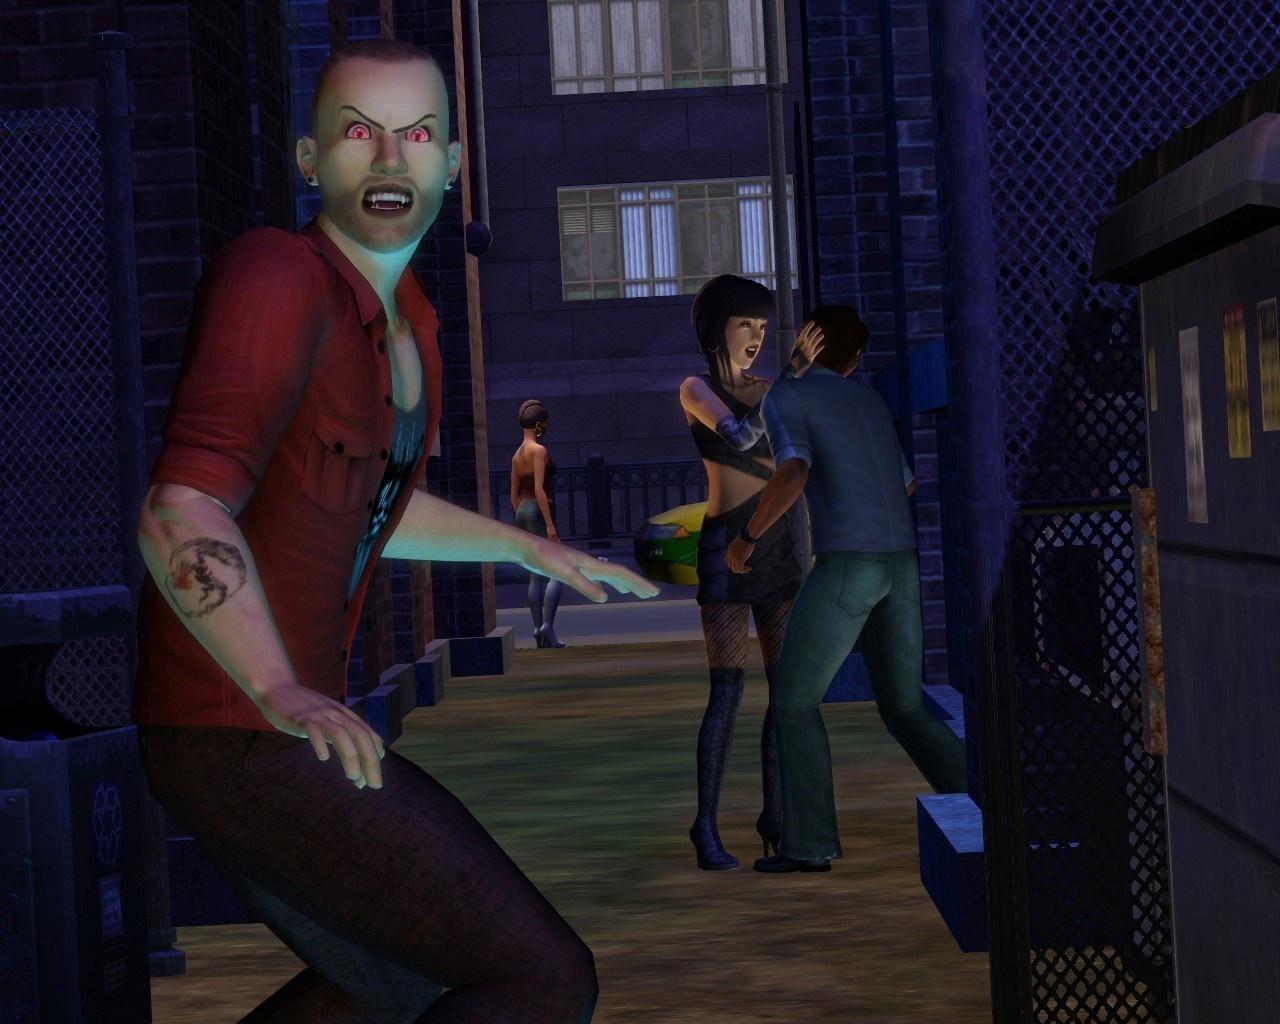 vampire-les-sims-3-acces-vip.jpg